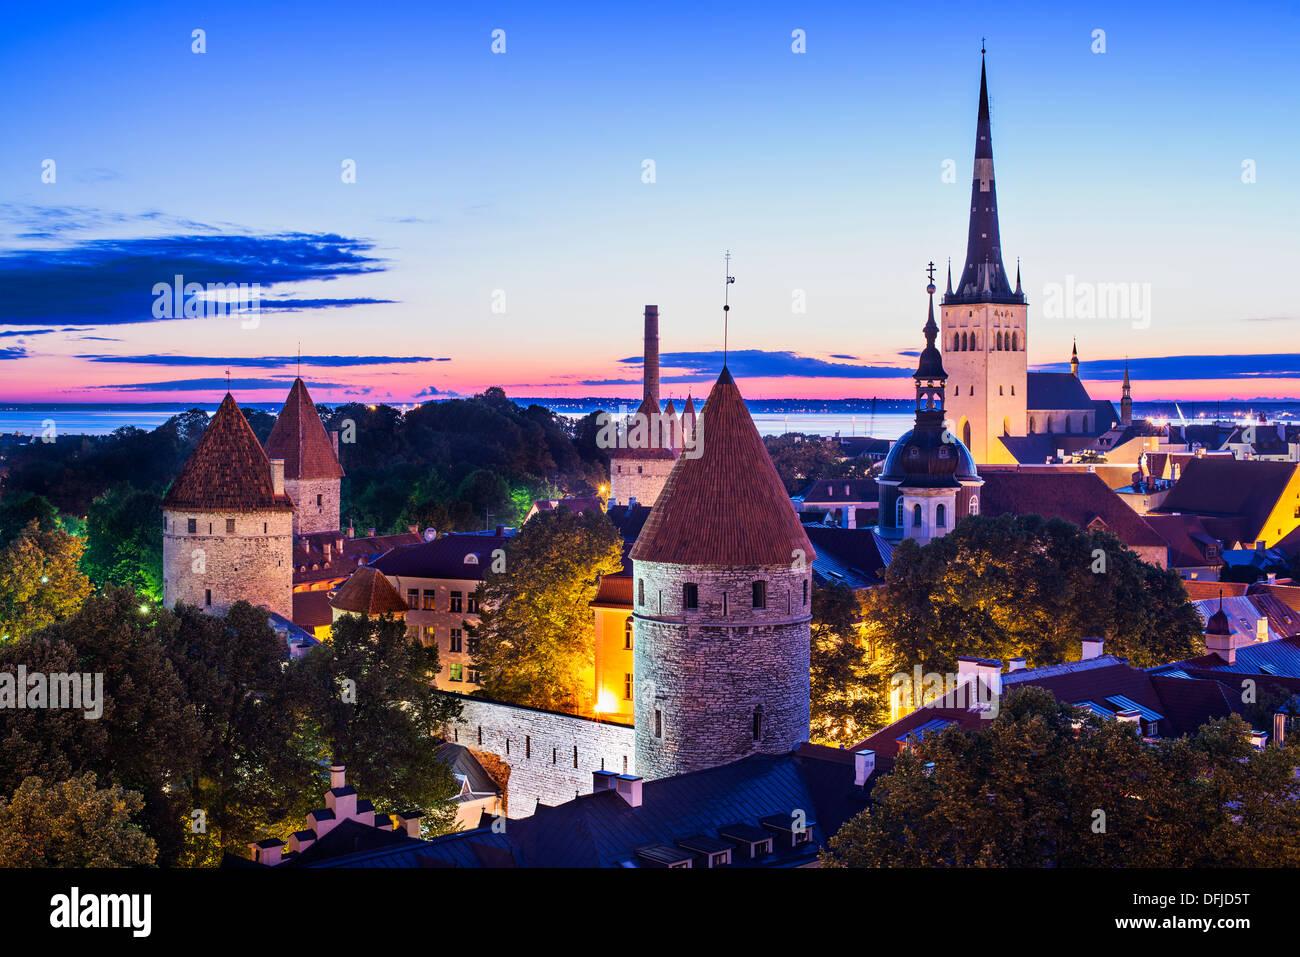 Skyline of Tallinn, Estonia at dawn. - Stock Image